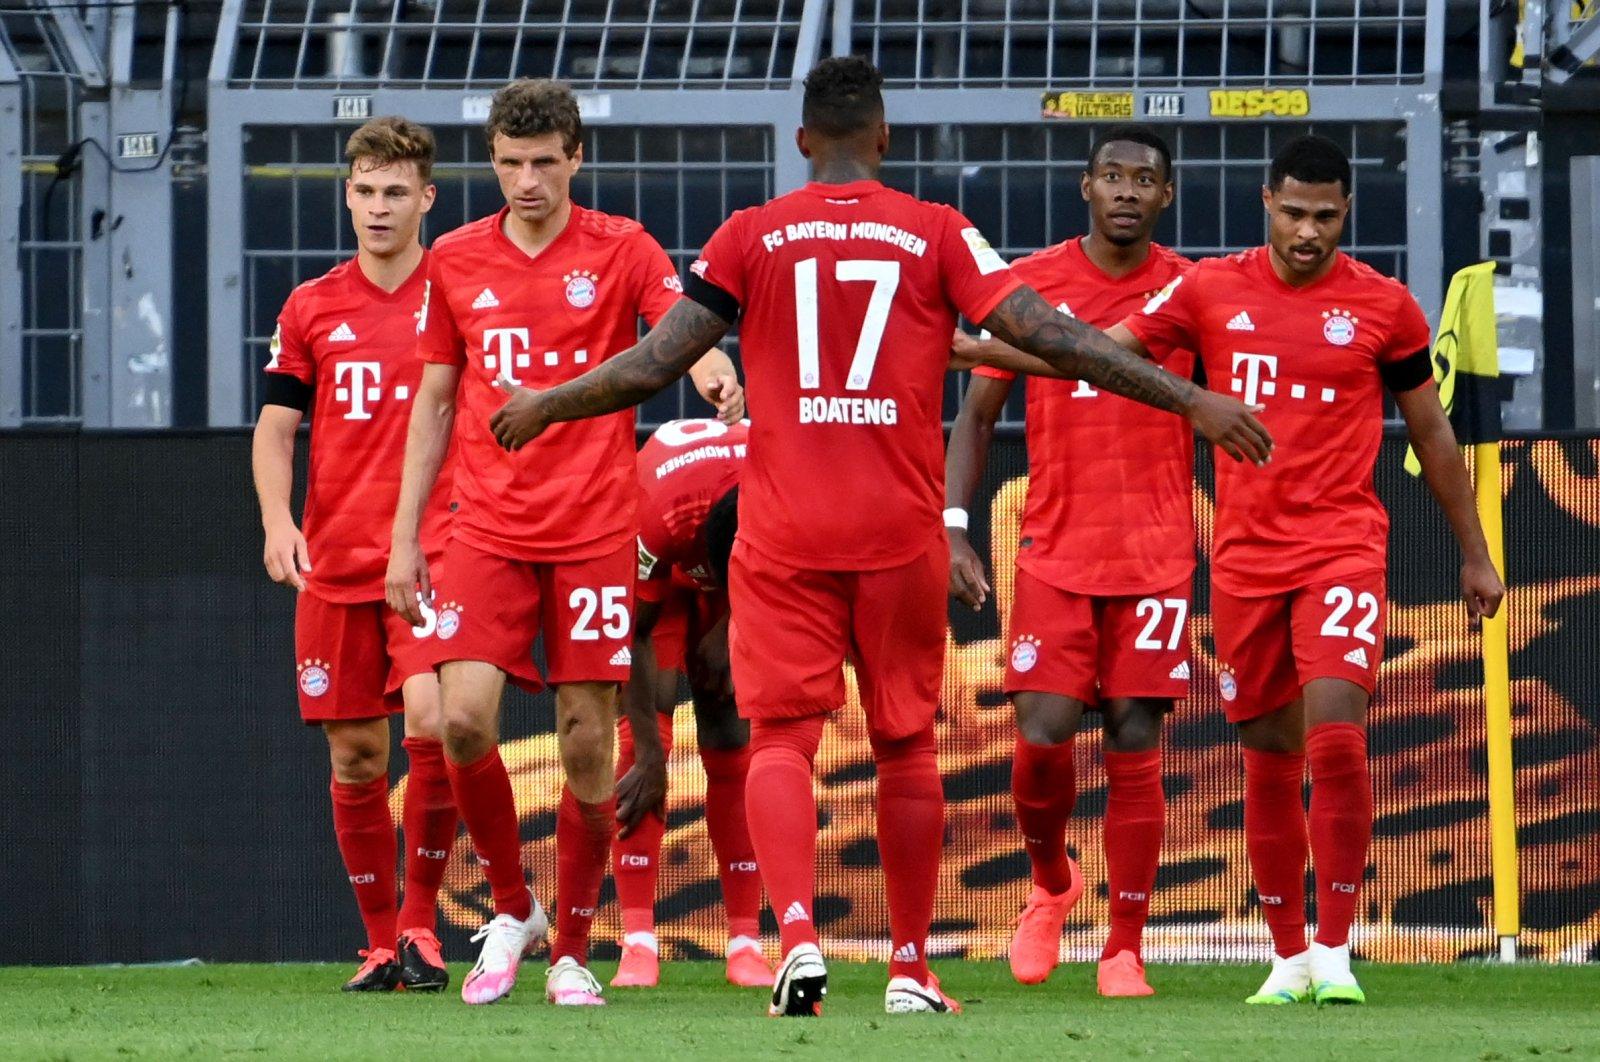 Bayern Munich players celebrate scoring a goal during Bundesliga football match between Borussia Dortmund and Bayern Munich, in Dortmund, Germany, May 26, 2020 (AFP Photo)